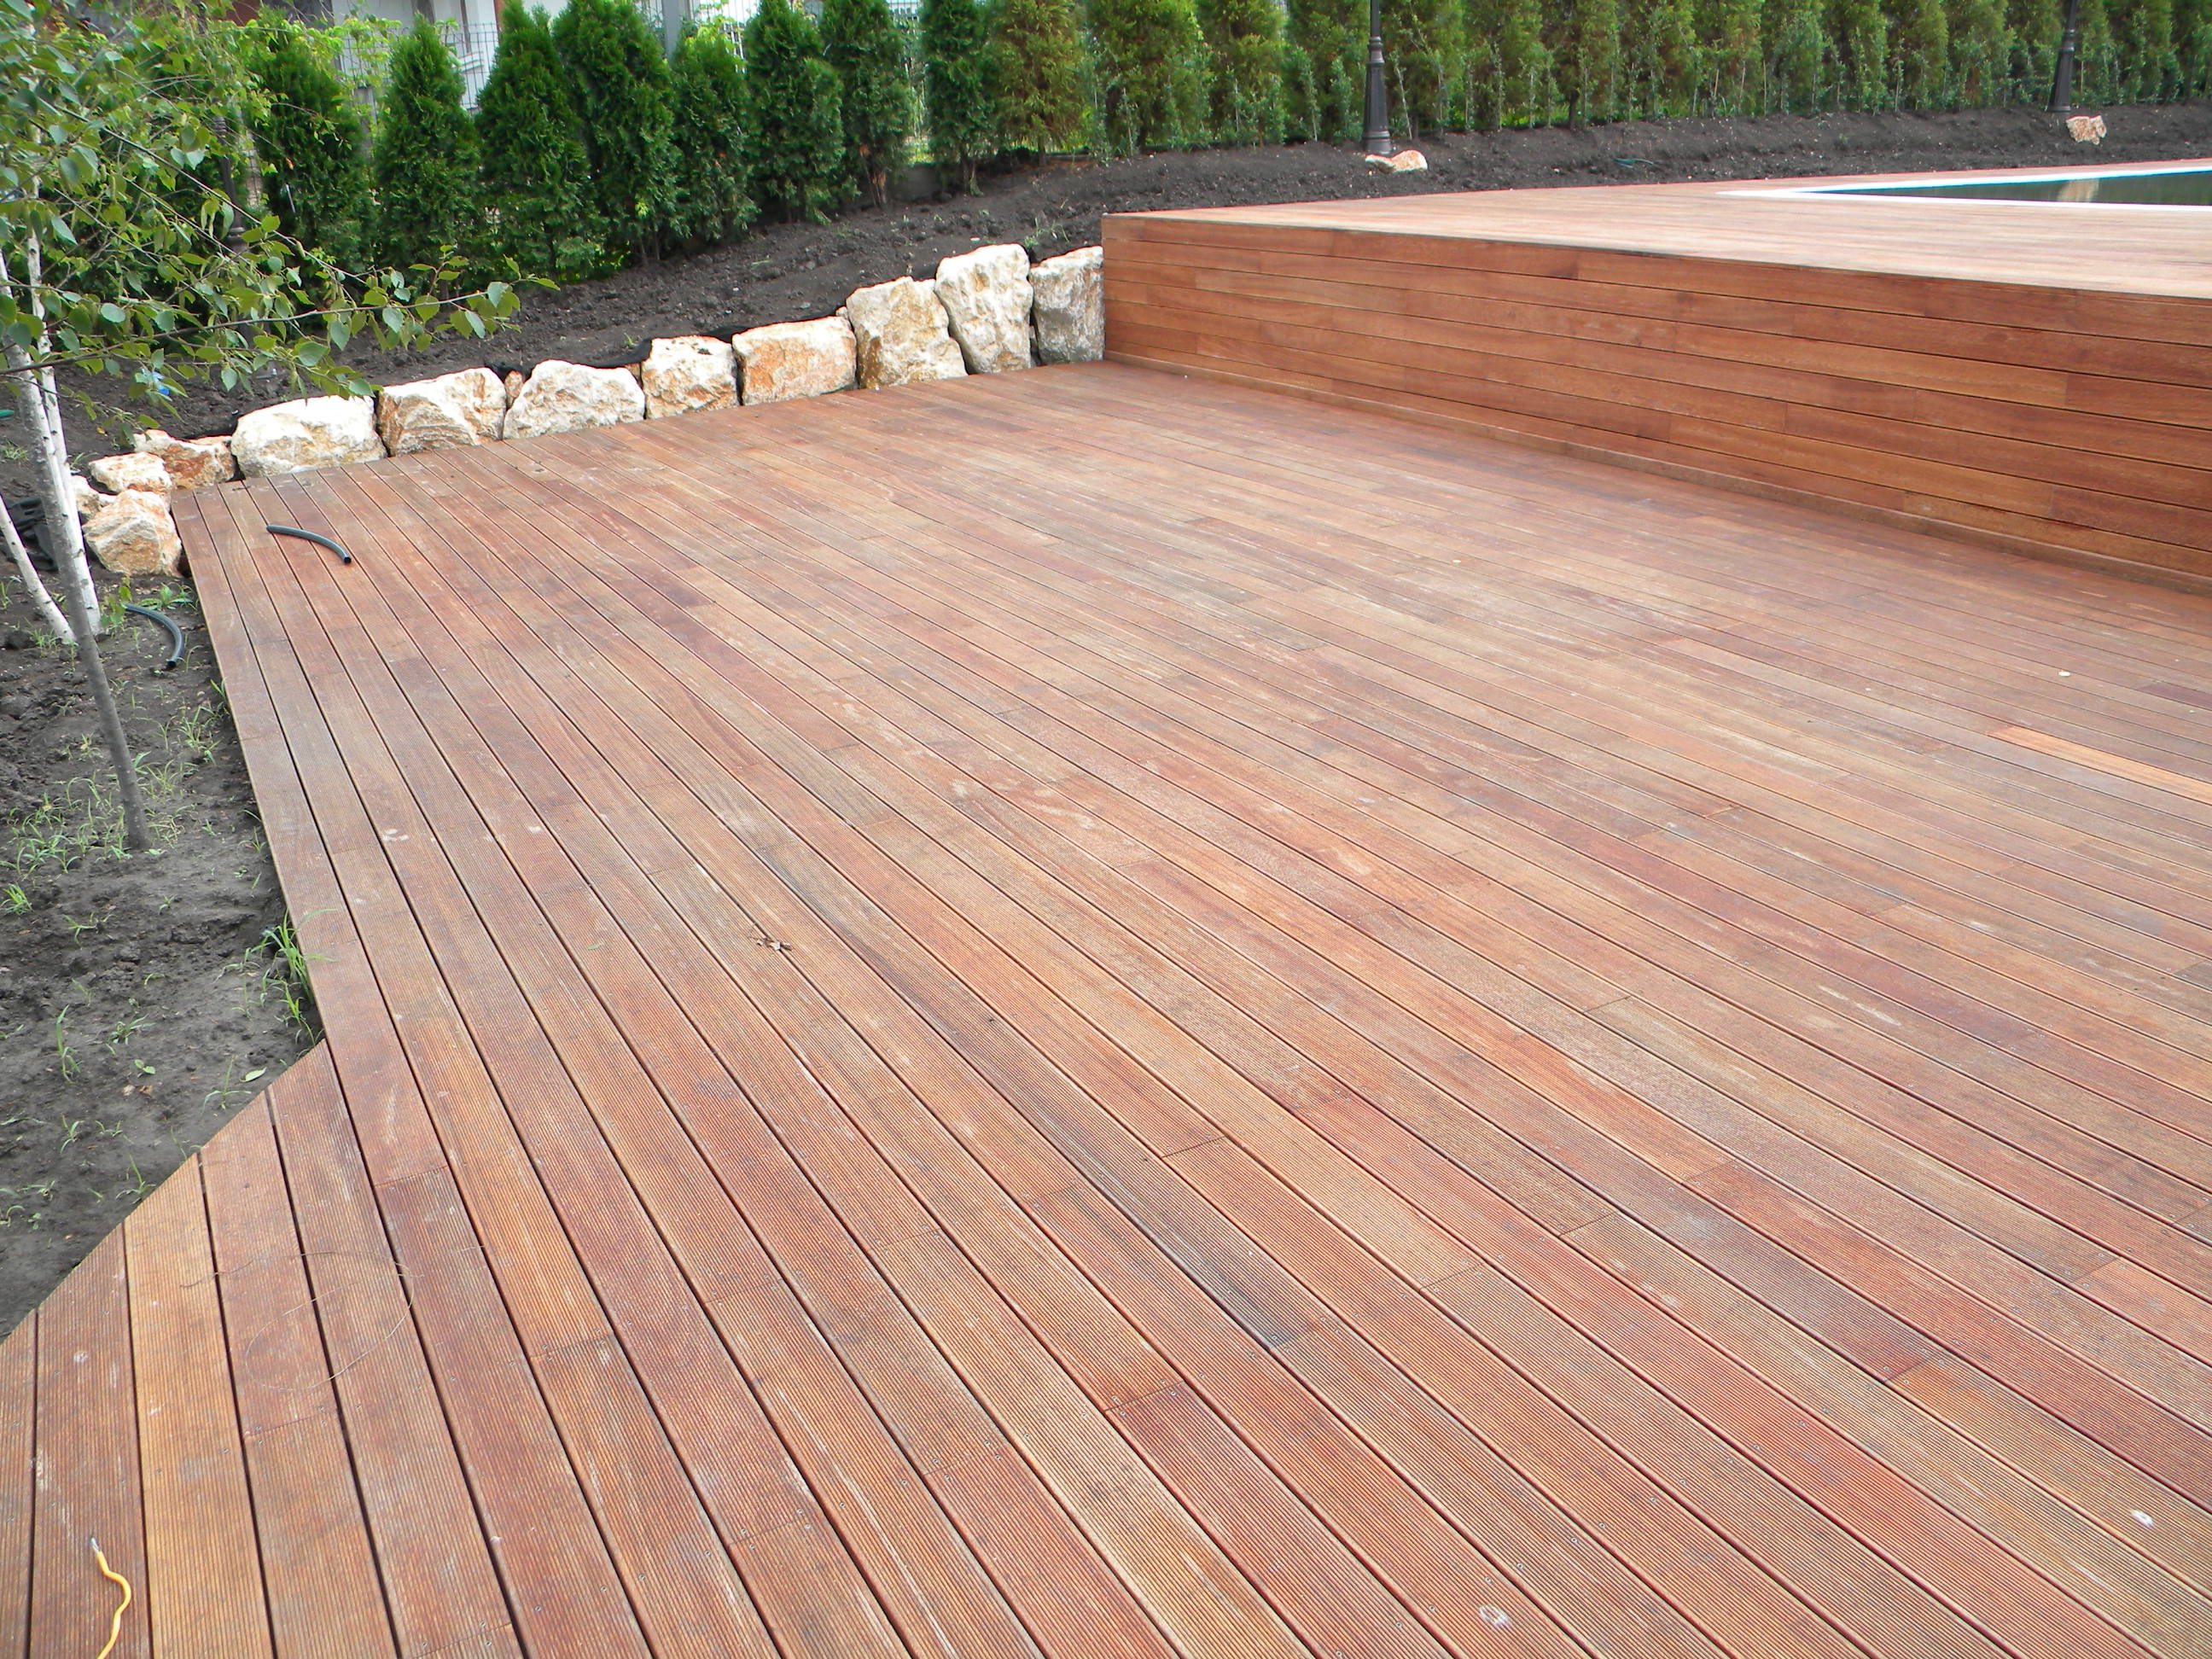 Deck-uri lemn - Angelim Pedra SELVA FLOORS - Poza 20